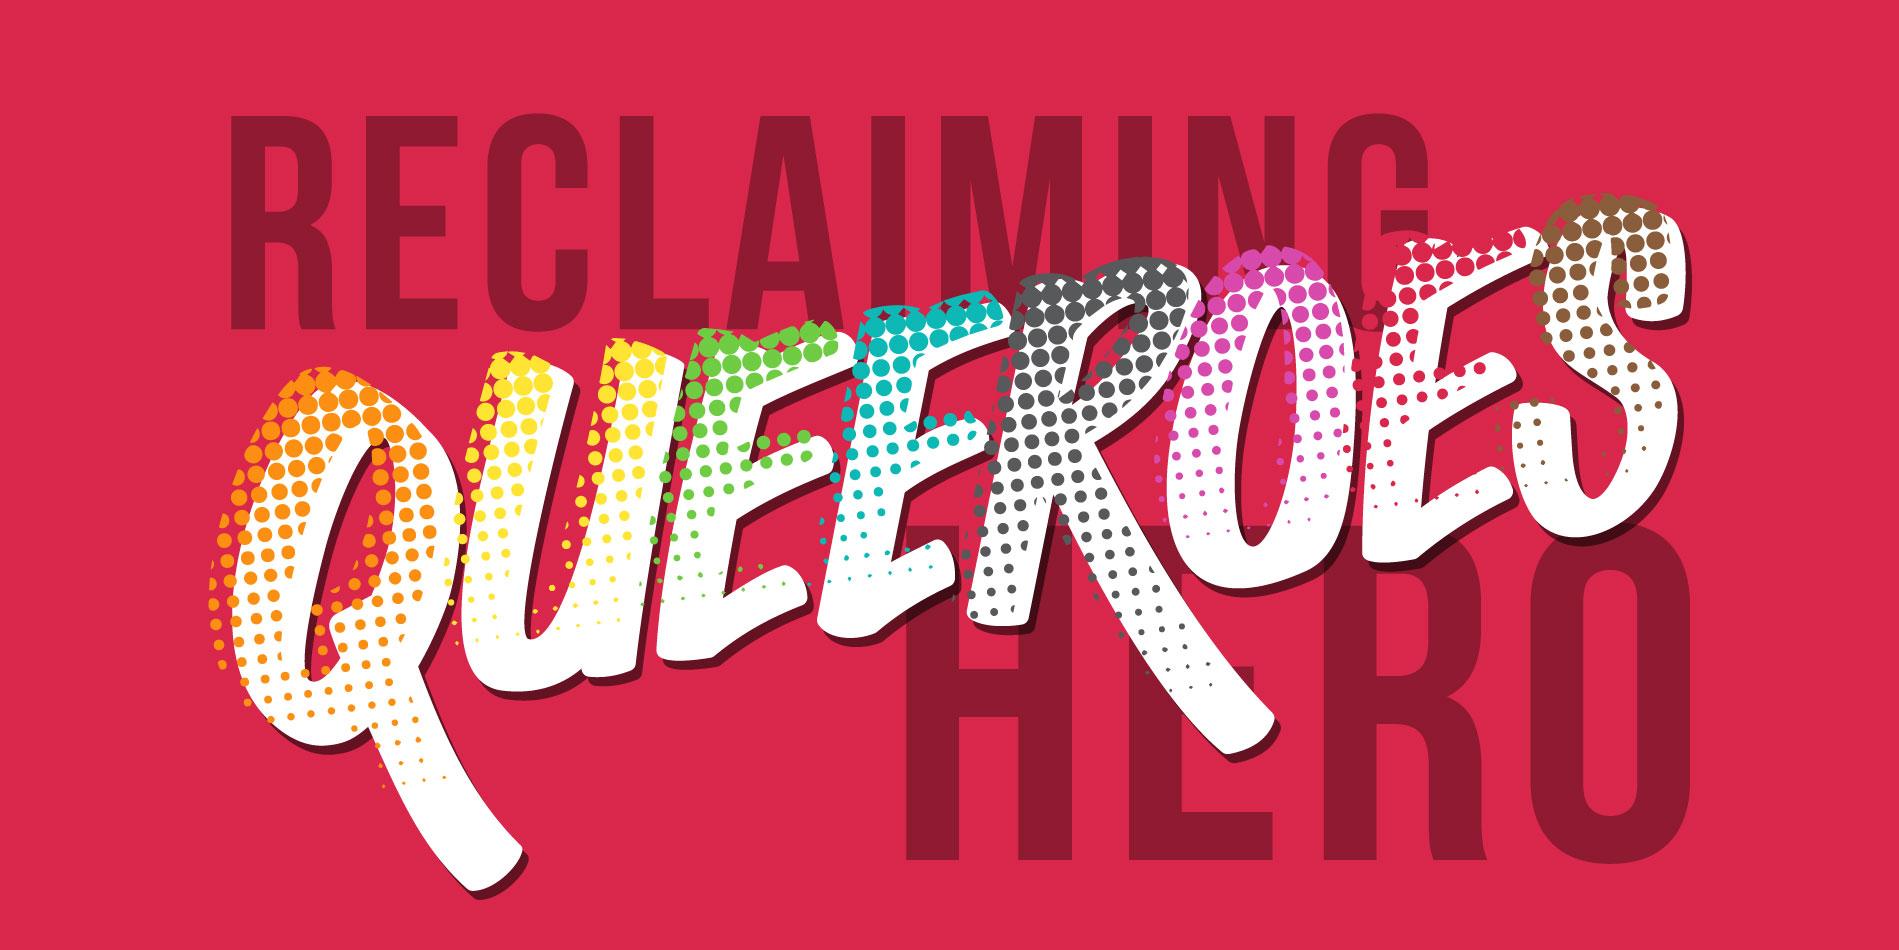 Queeroes: Reclaiming Hero